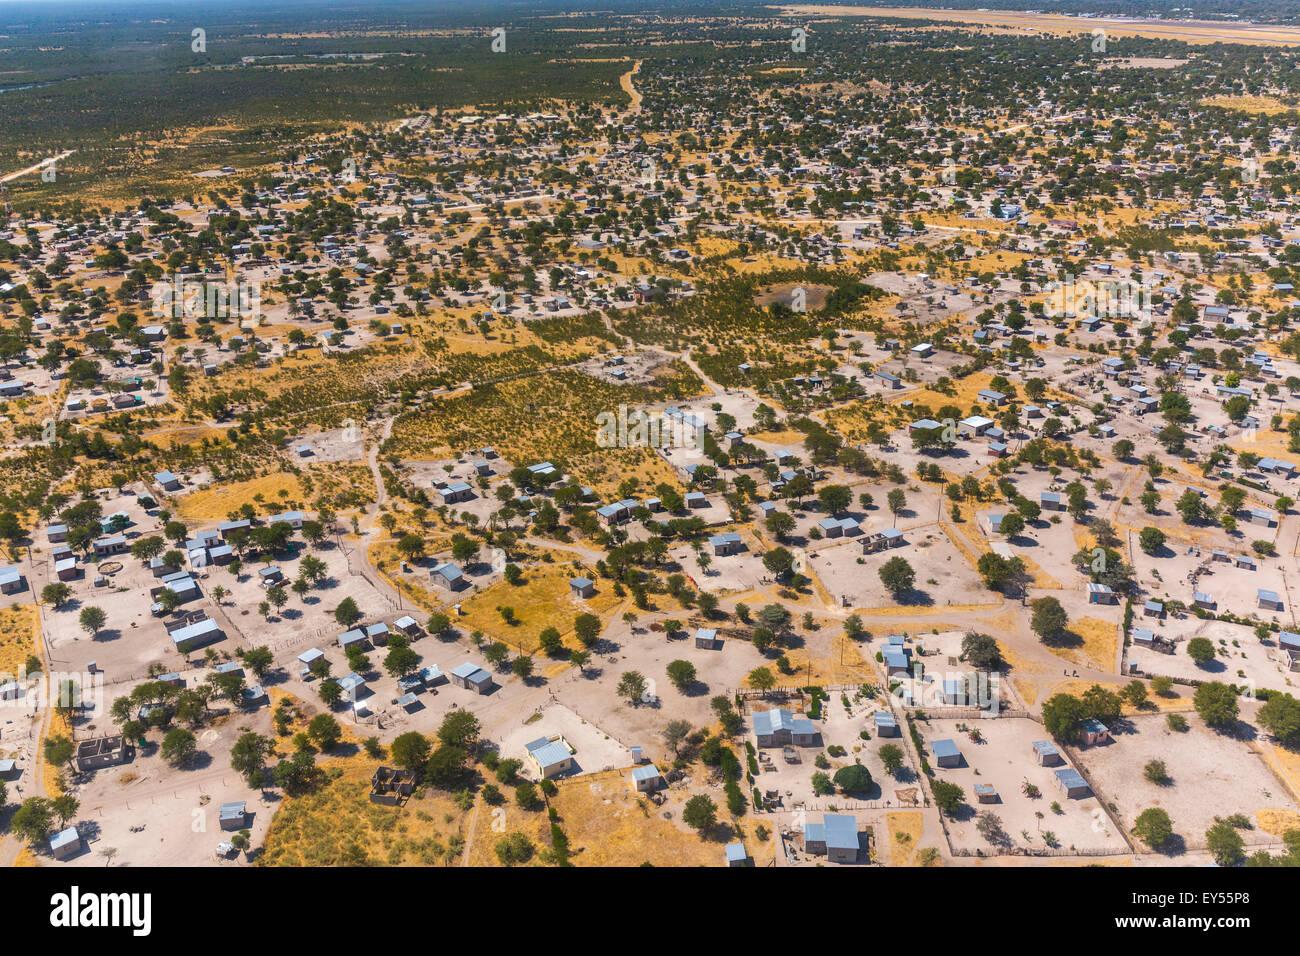 Aerial view of Maun city - Okavango Delta Botswana - Stock Image